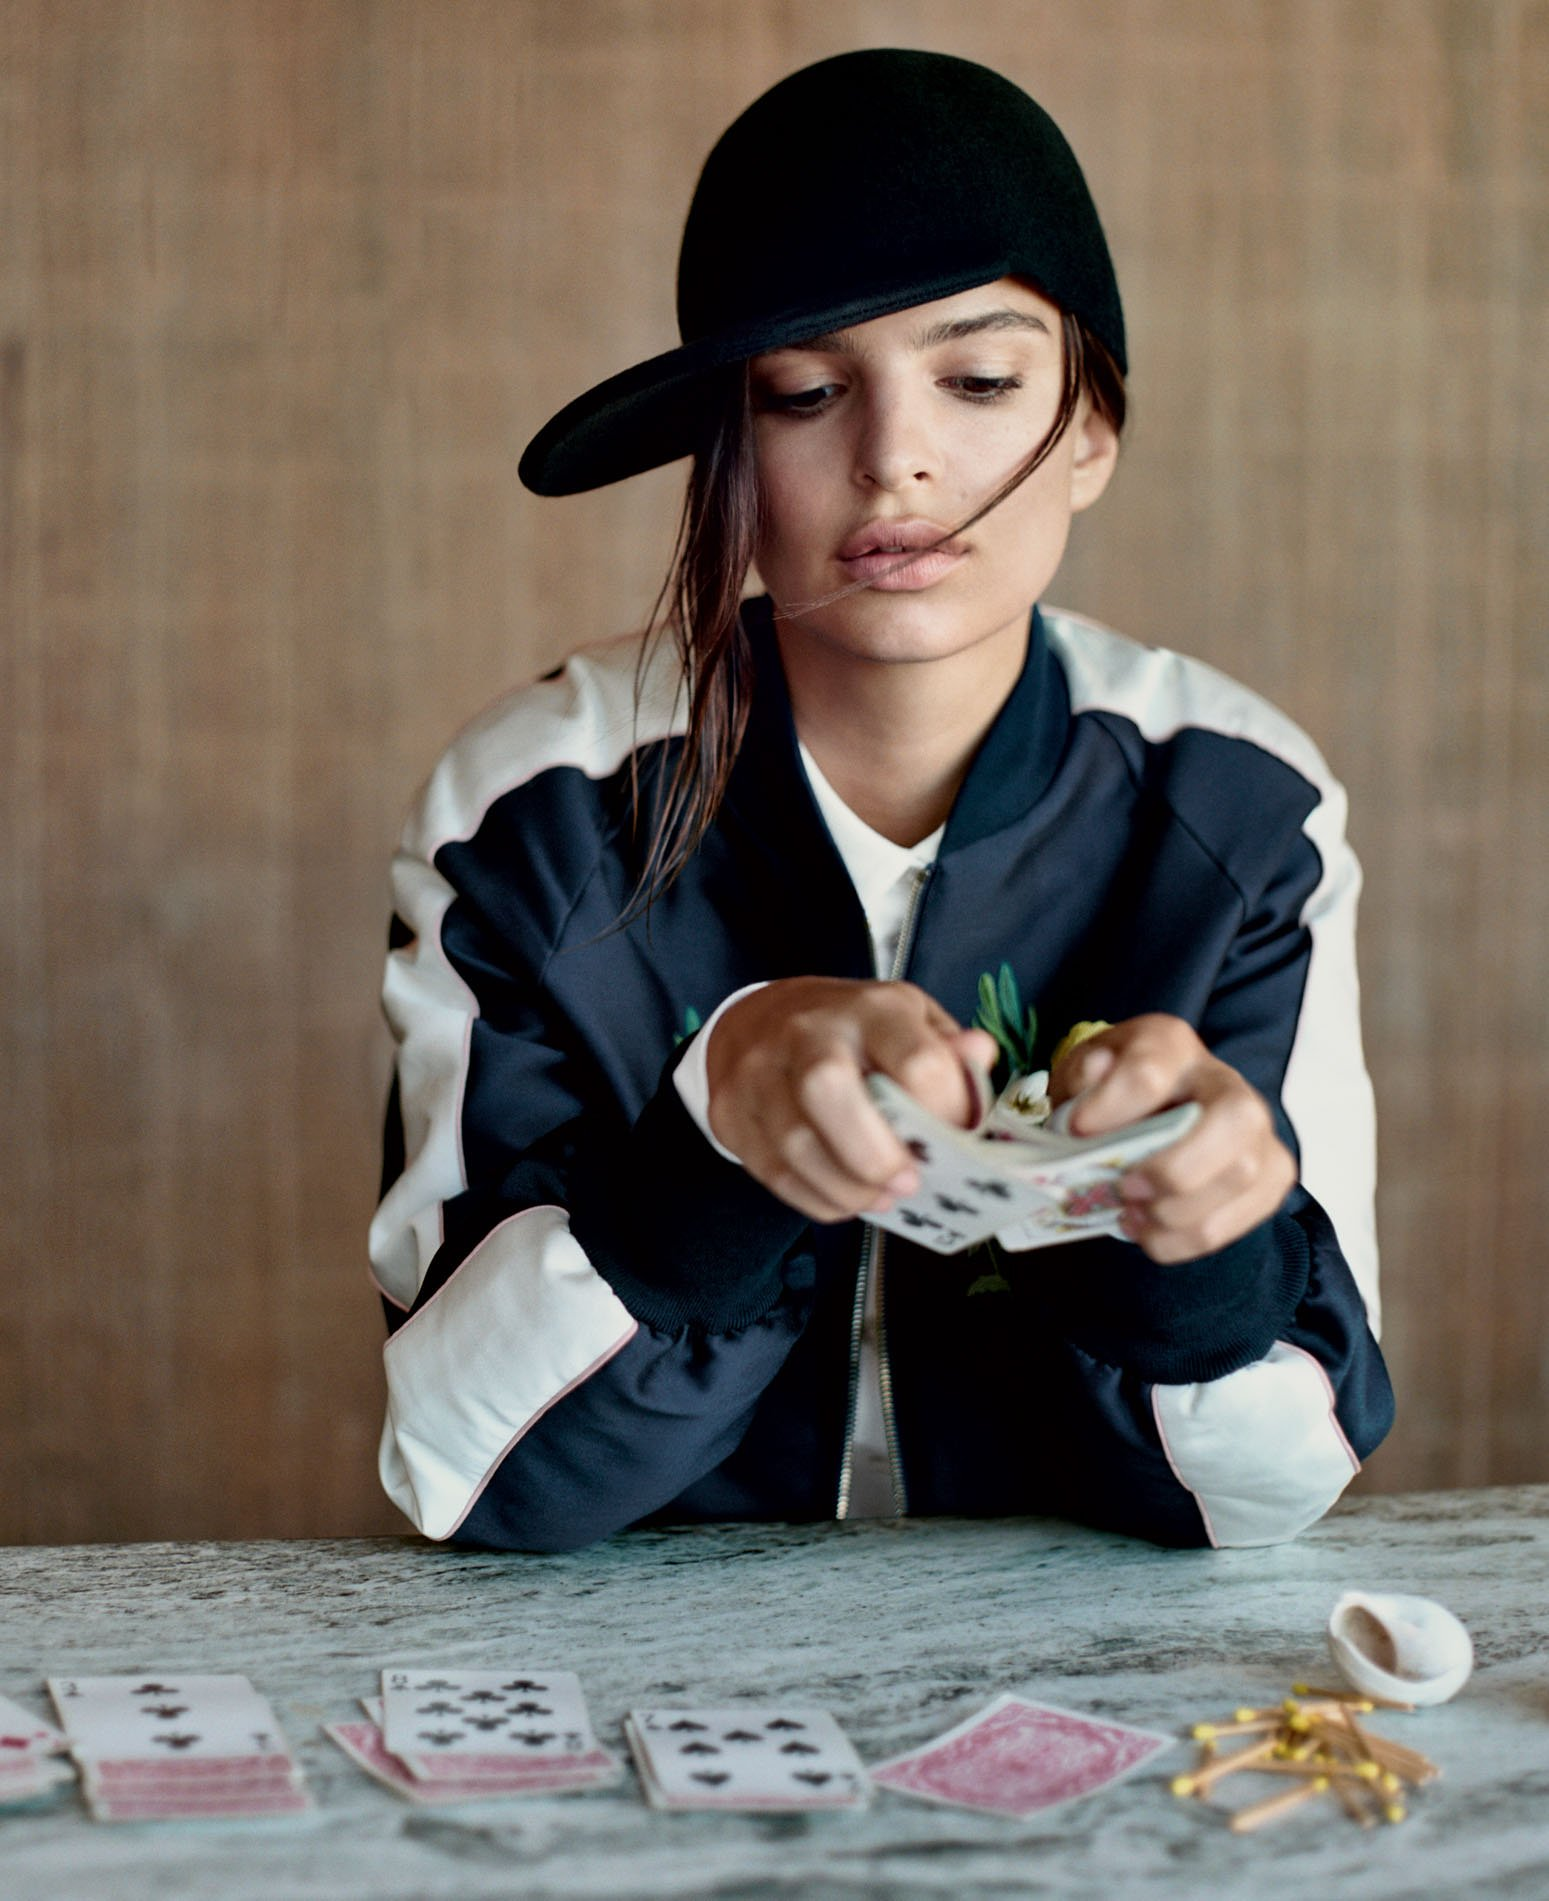 emily-ratajkowski-fall-fashion-hats-06.jpg